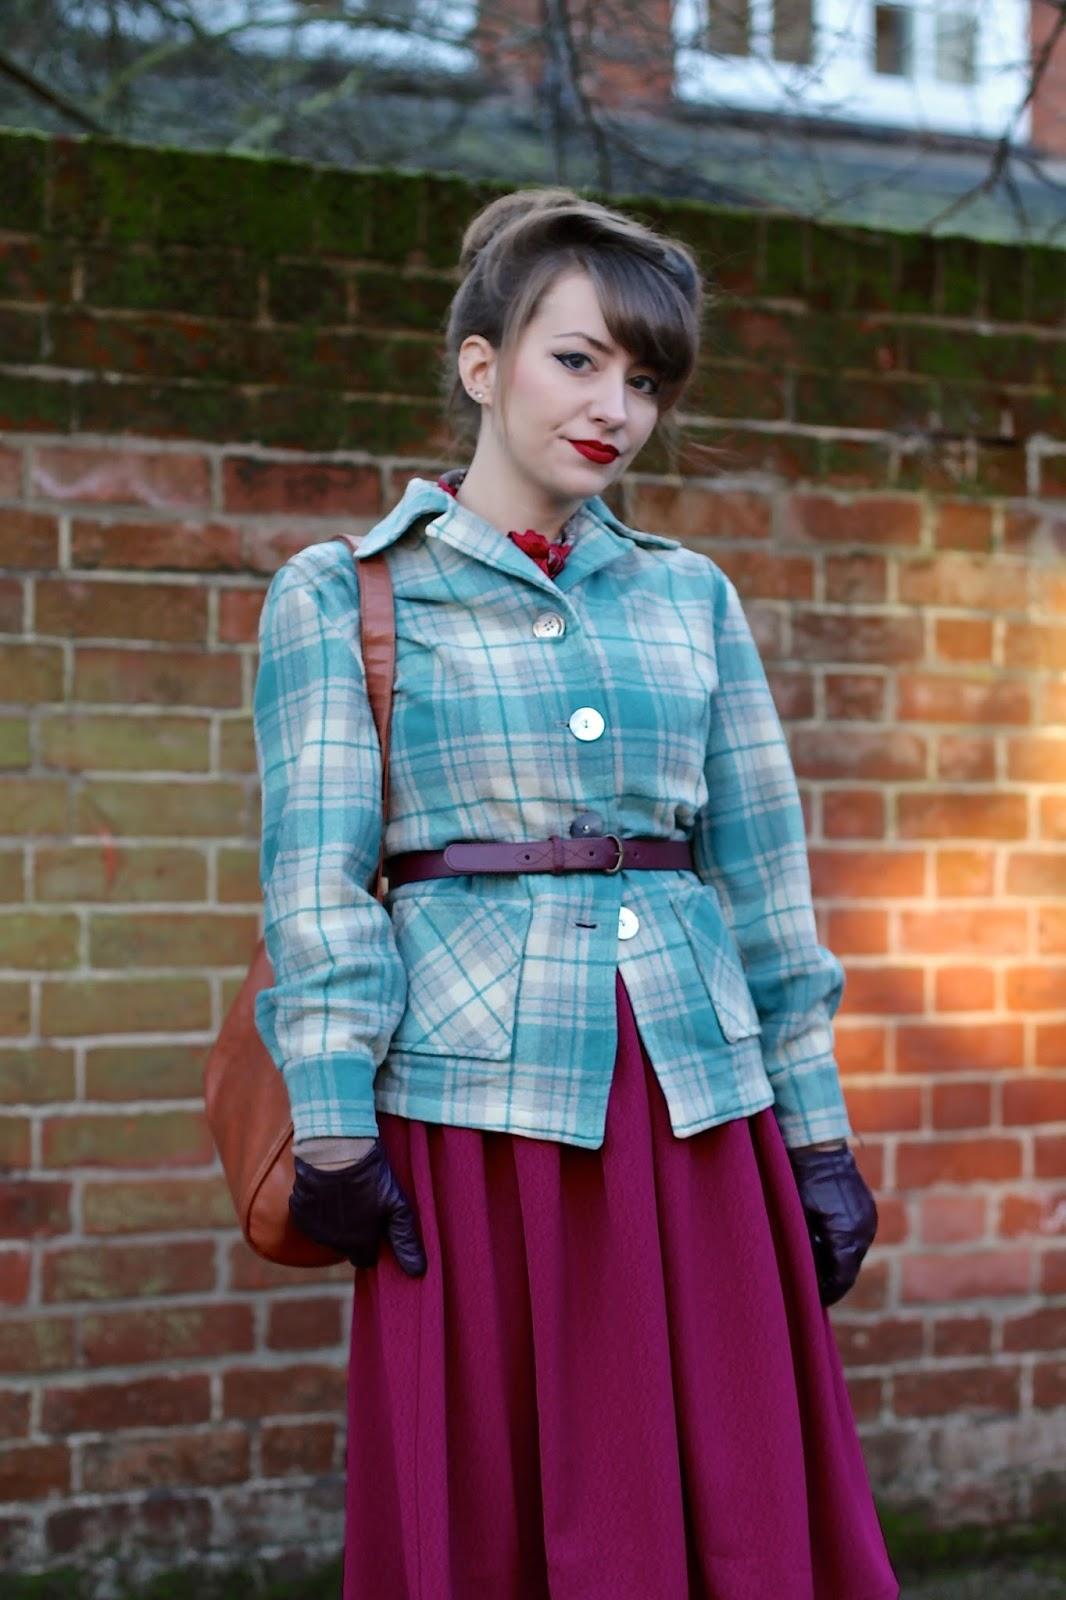 Pendleton 49er style jacket - vintage style outfit